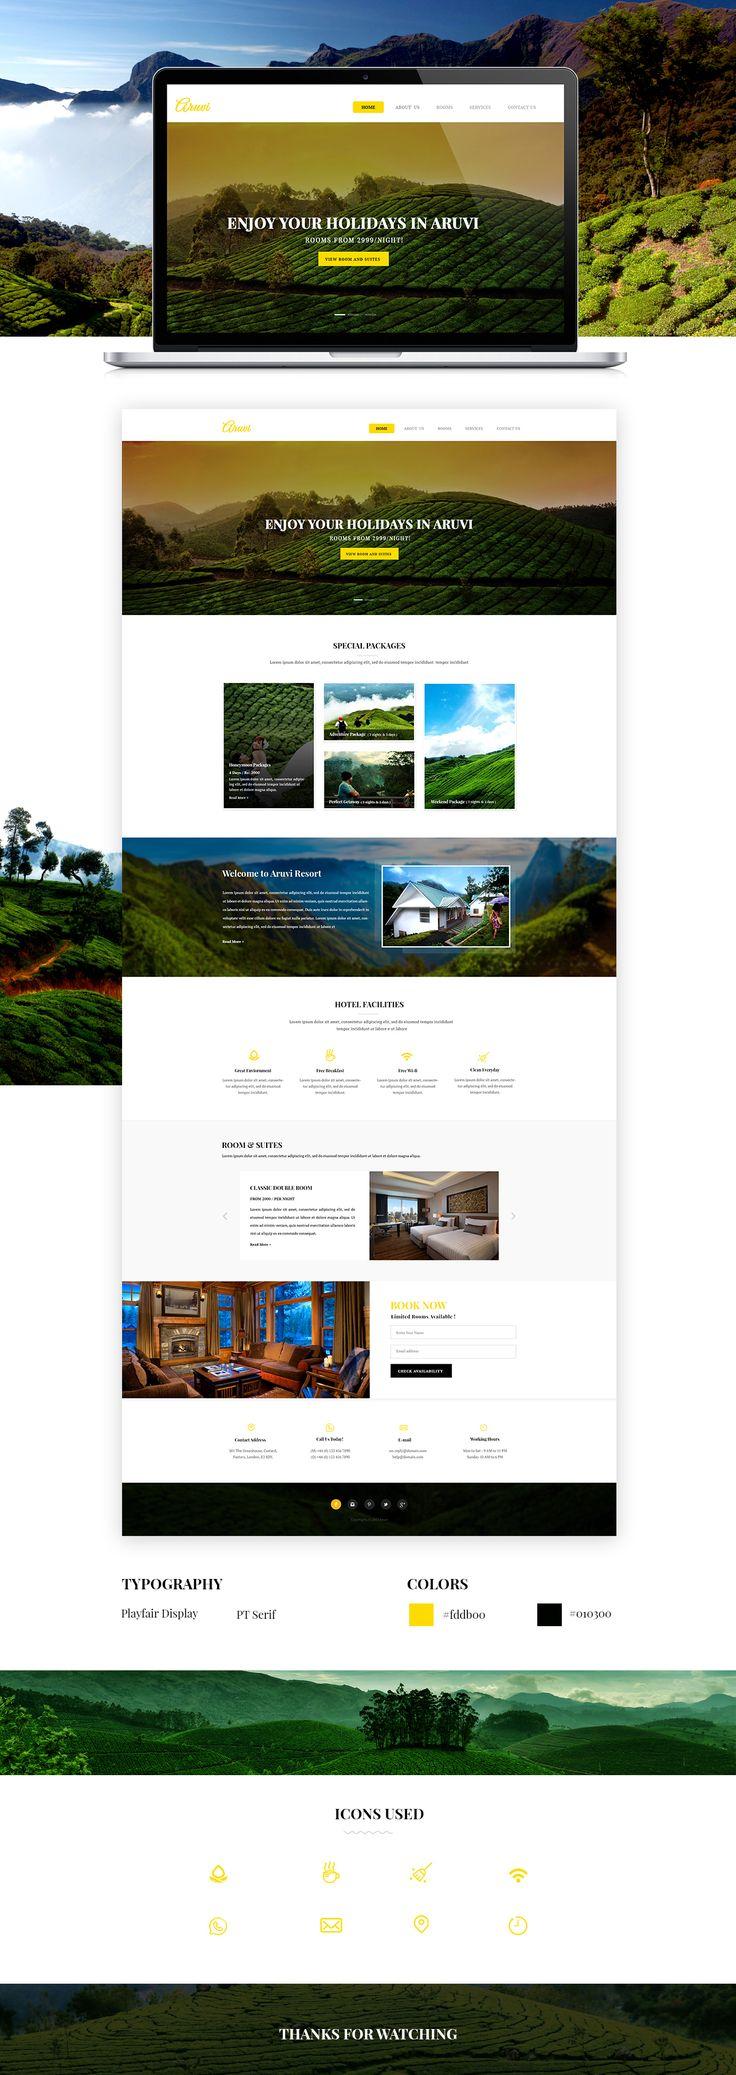 Web Design, UI Design on Behance